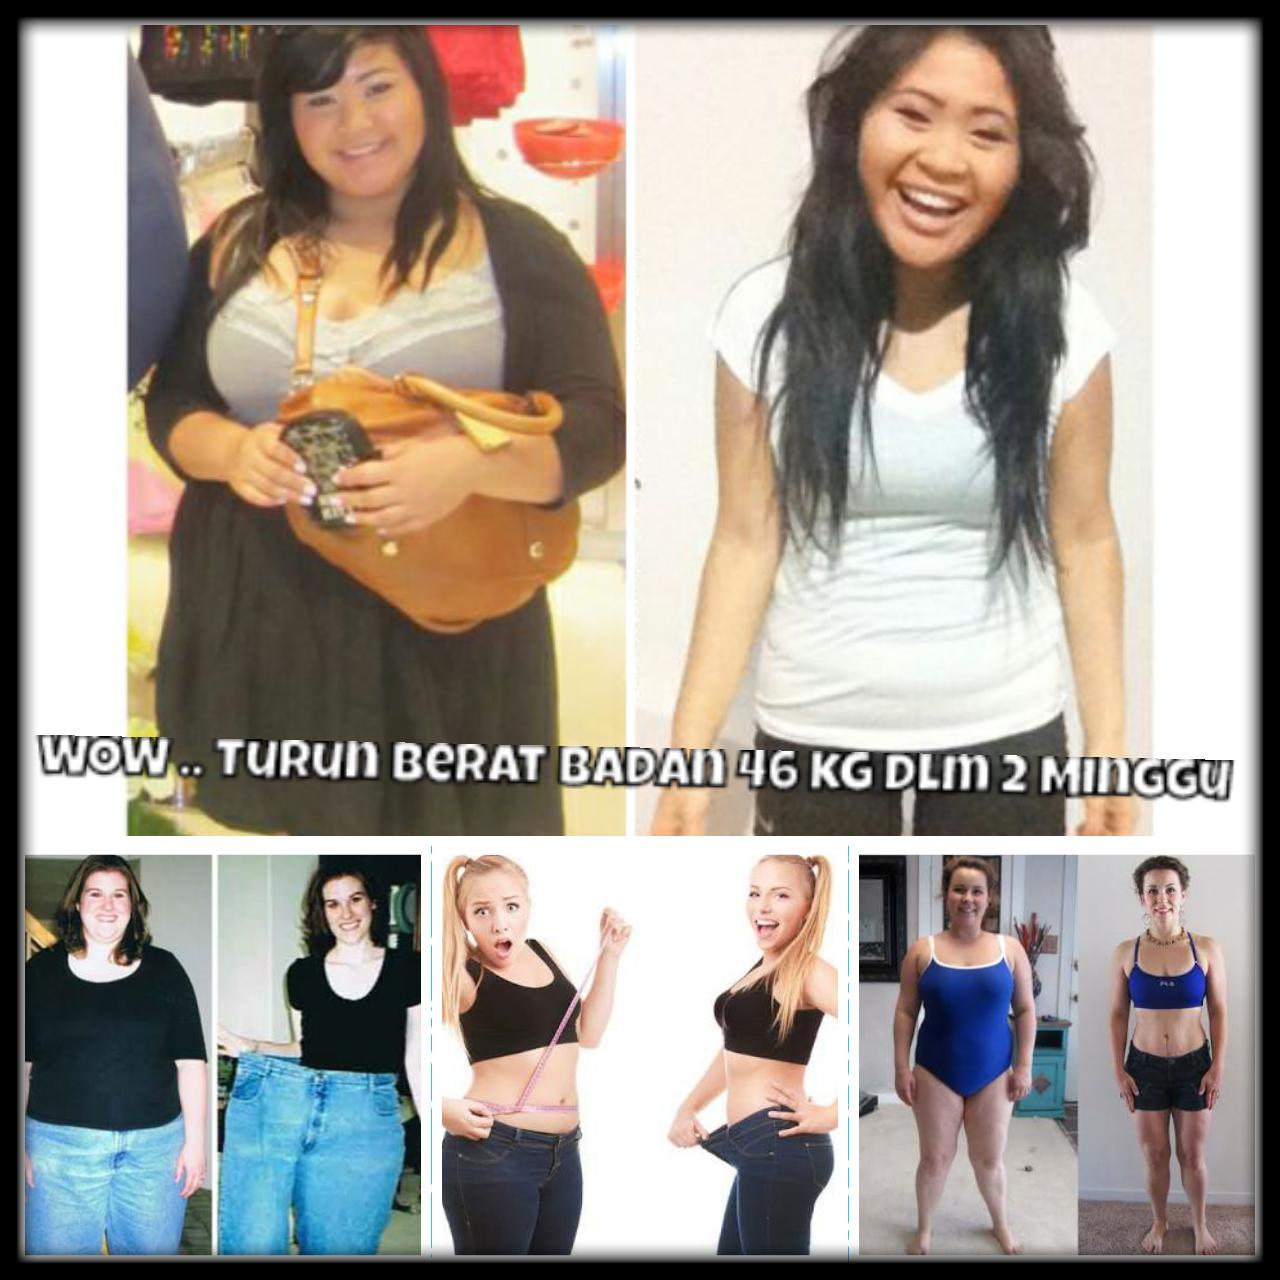 WOW Wanita Ini Turun Berat Nya Dari 98 Kilo Menjadi 56 Kilo